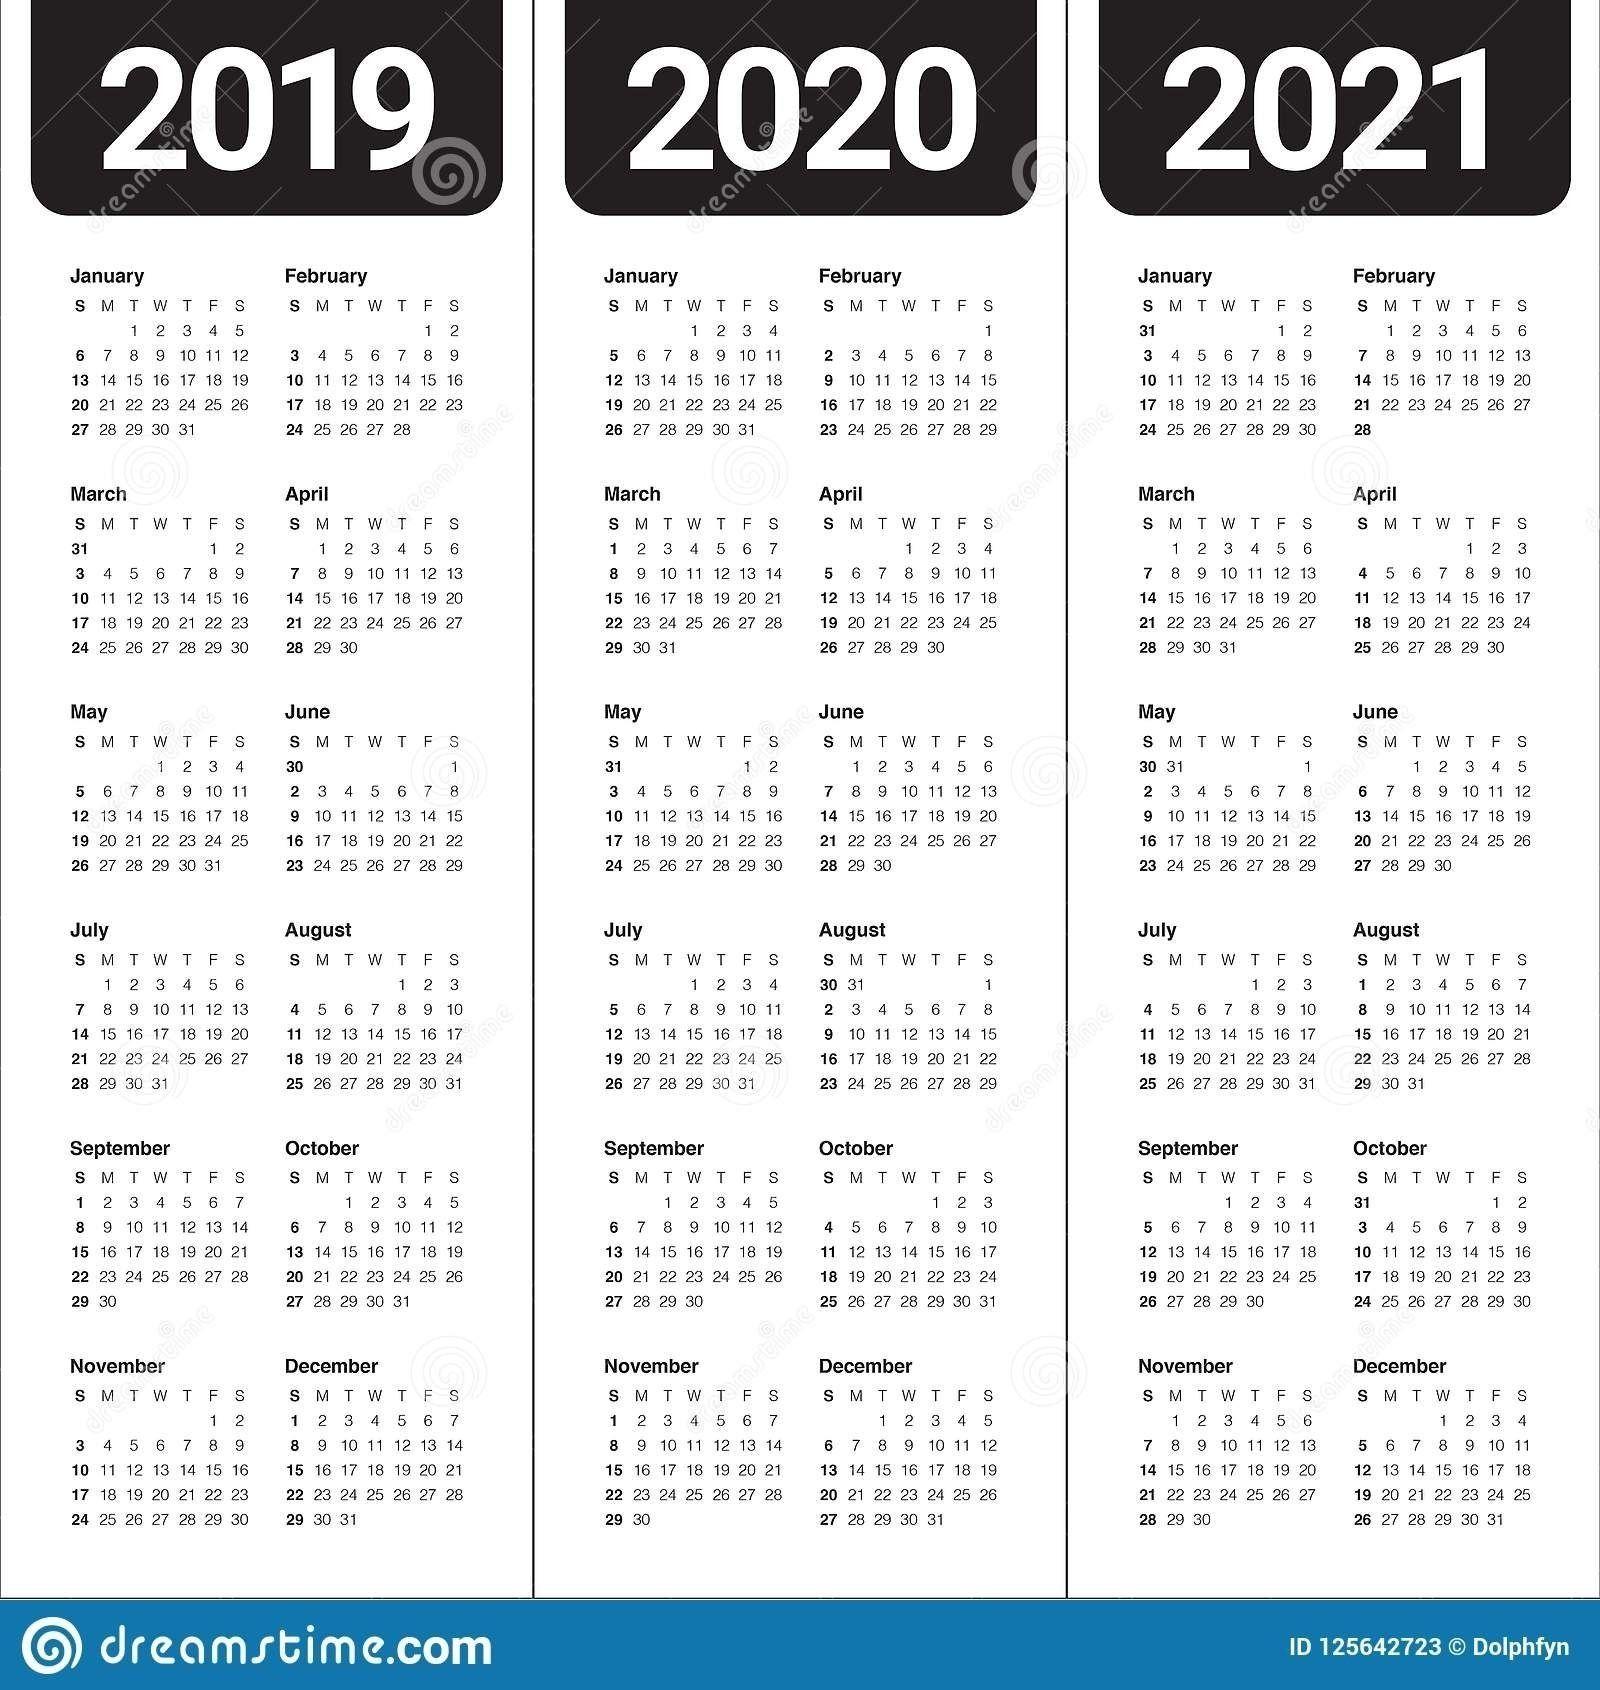 Depo Provera Calendar 2021 Calculator | Calendar Template